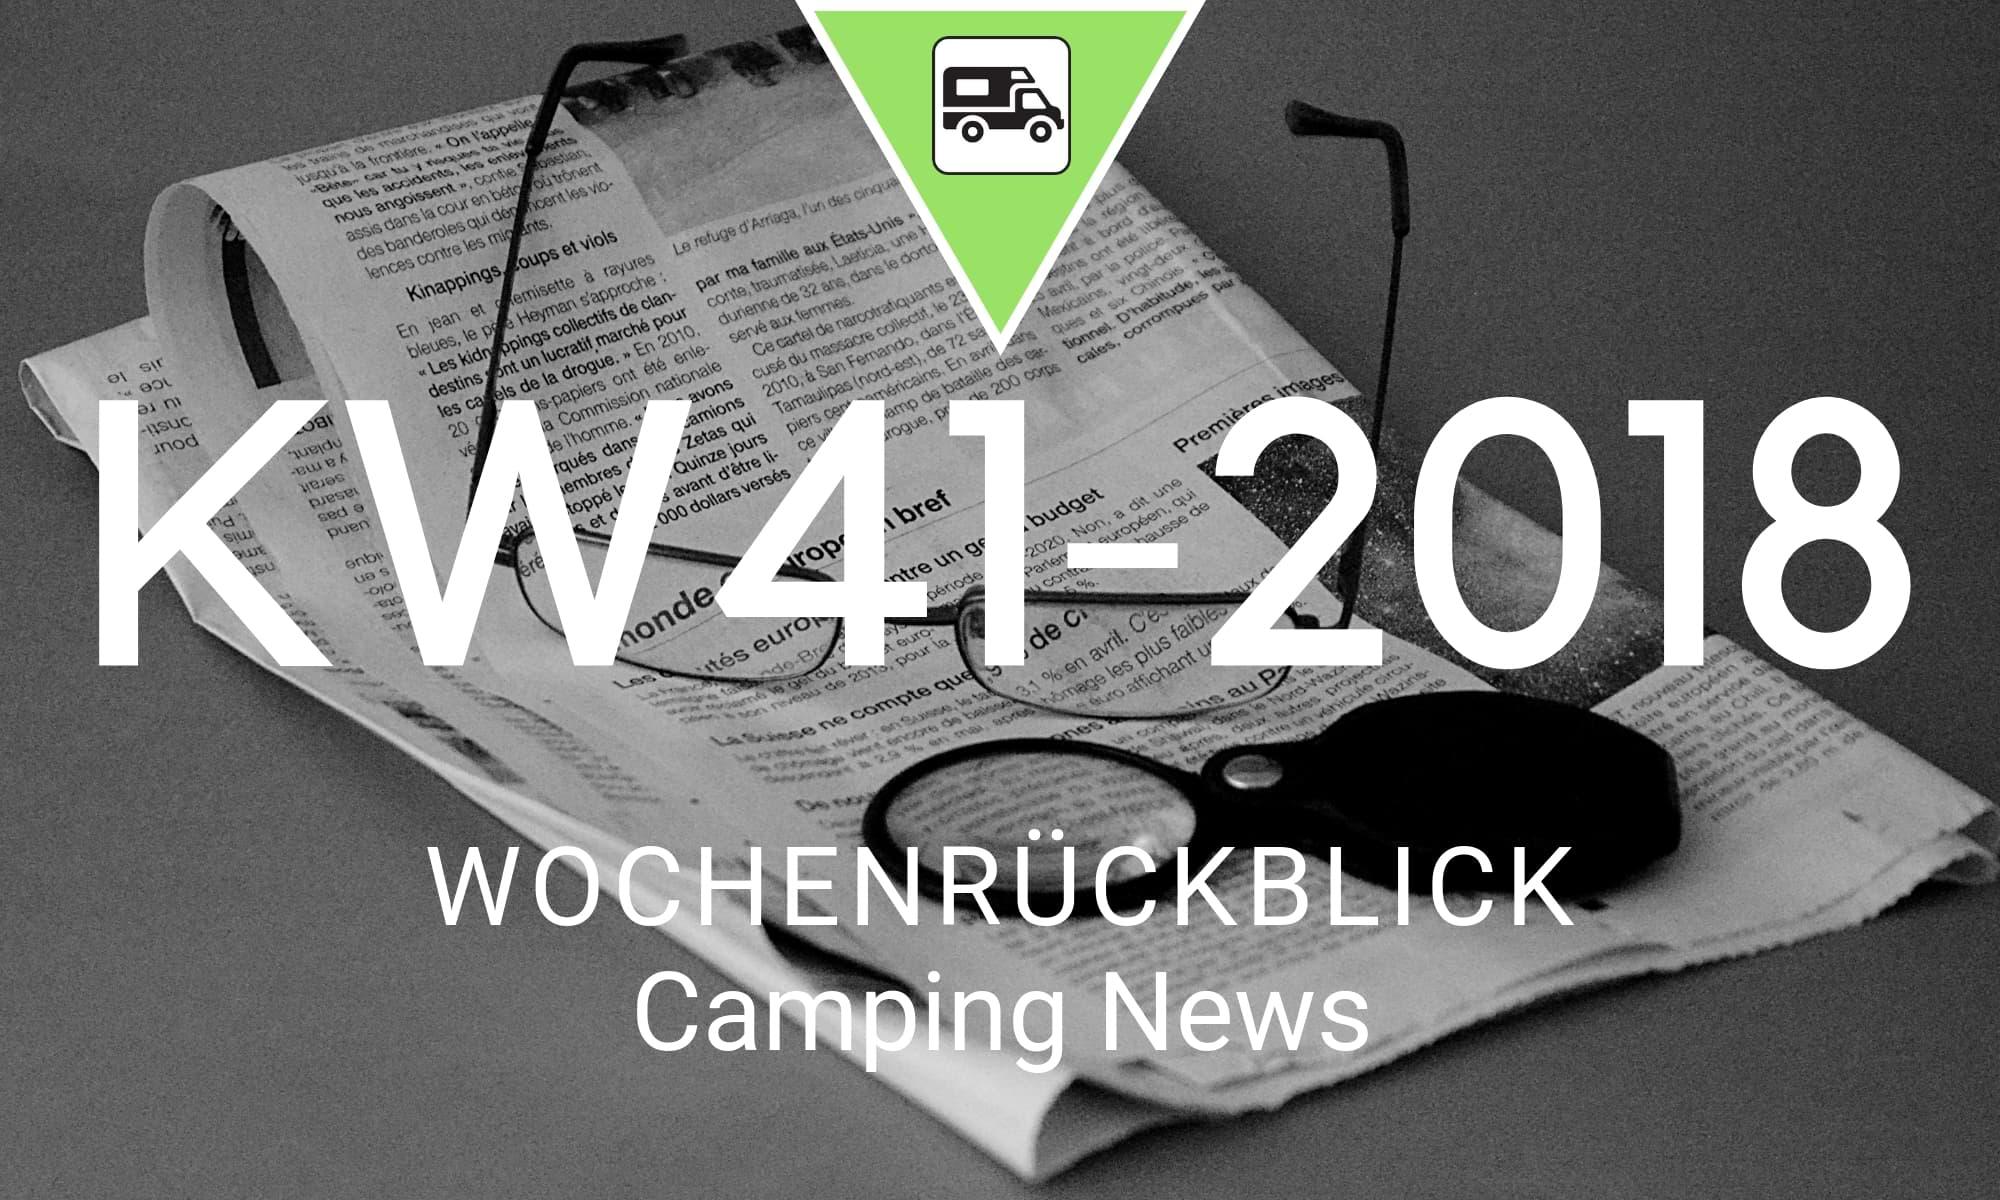 Wochenrückblick Camping News KW41-2018